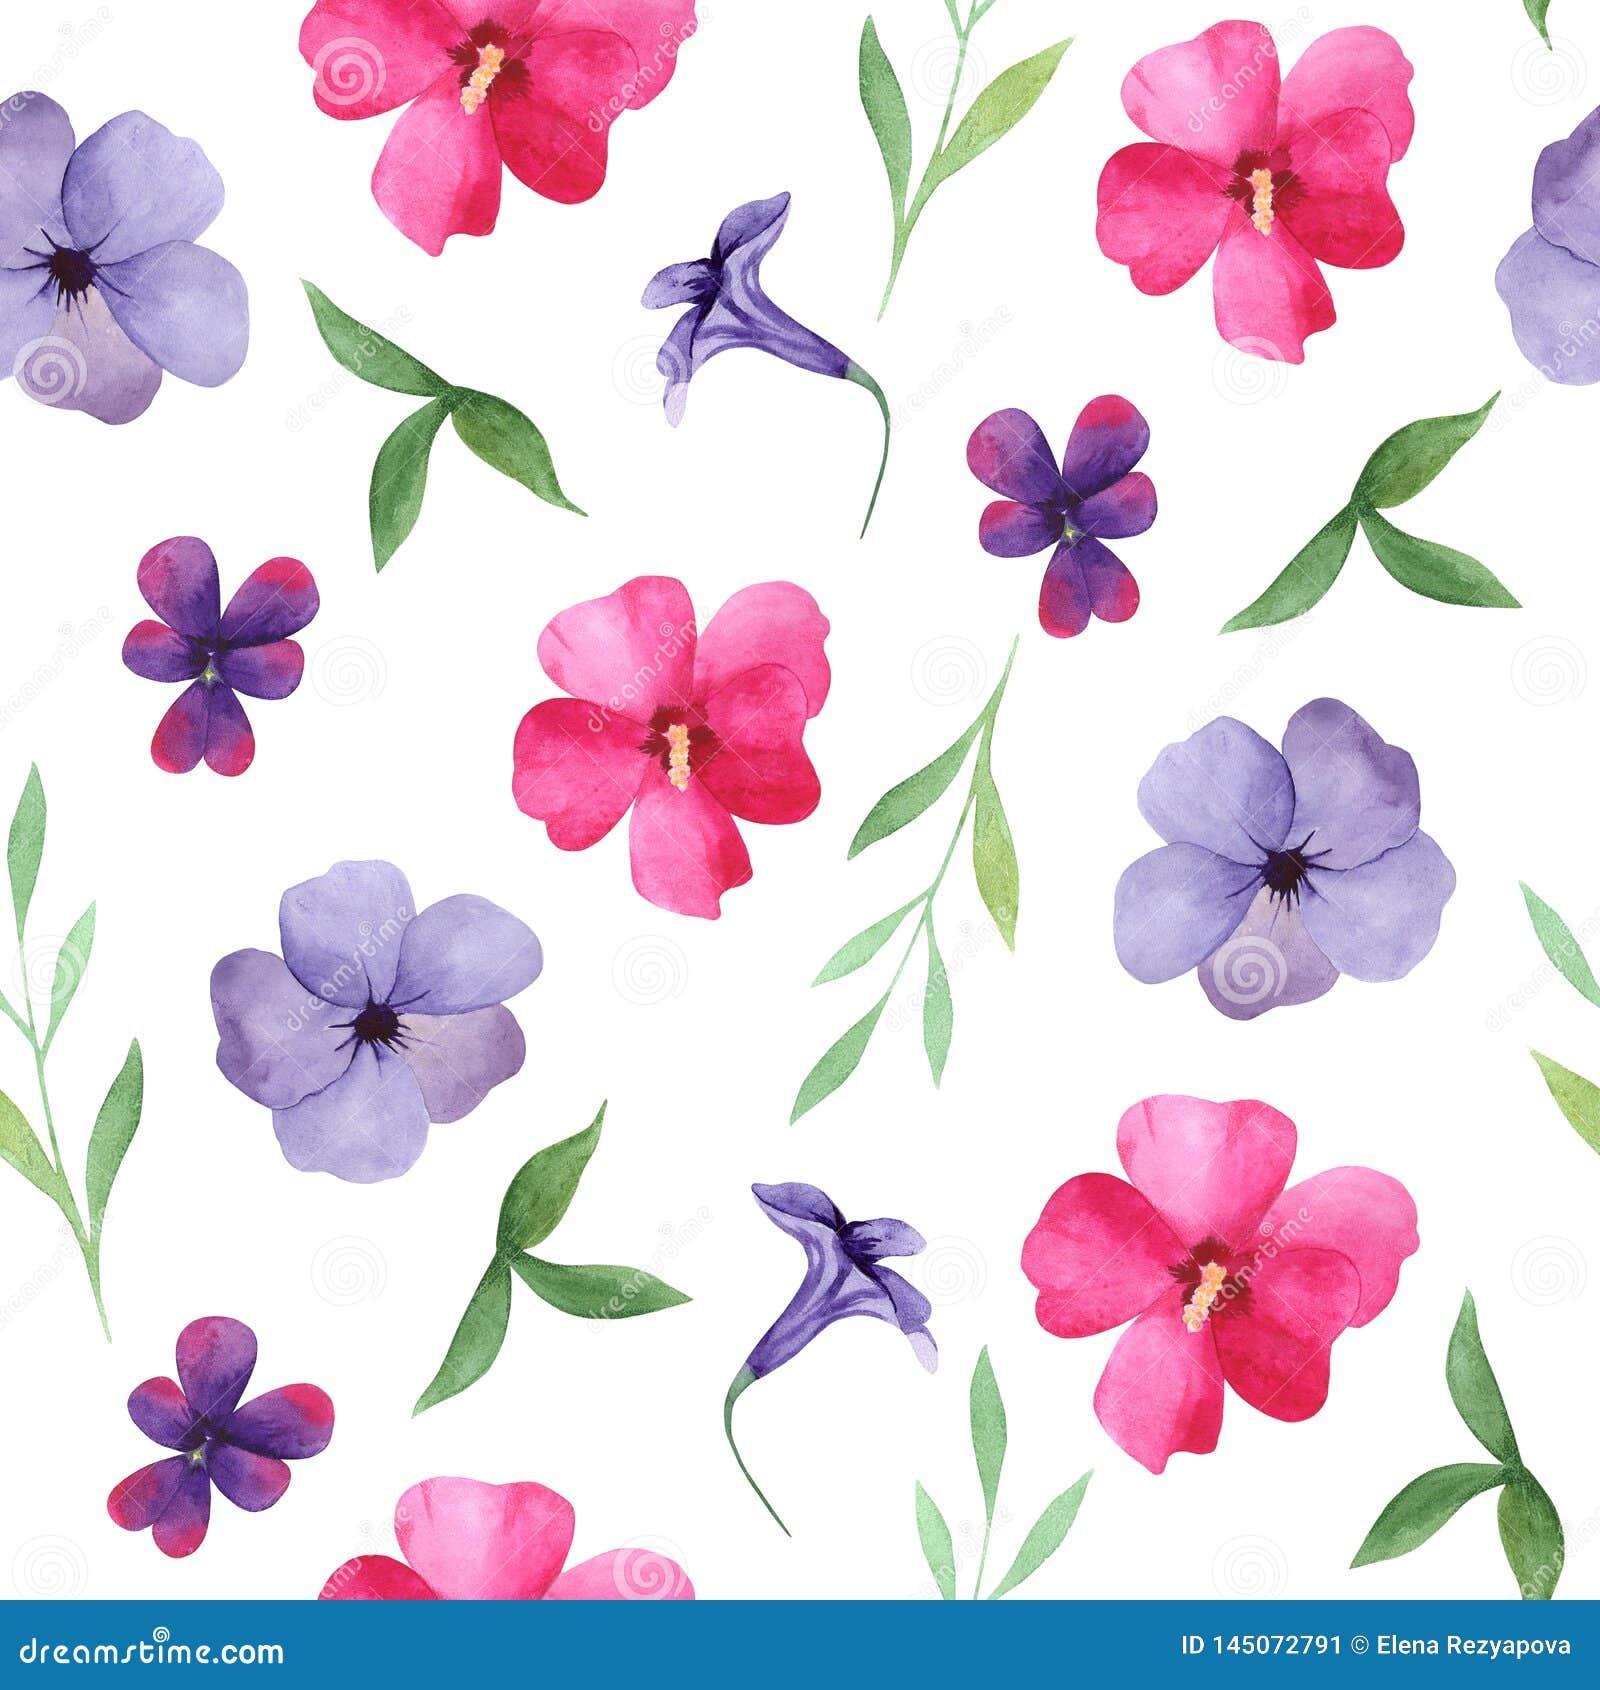 Floral άνευ ραφής σχέδιο Watercolor, ρόδινα και πορφυρά λουλούδια, φύλλα